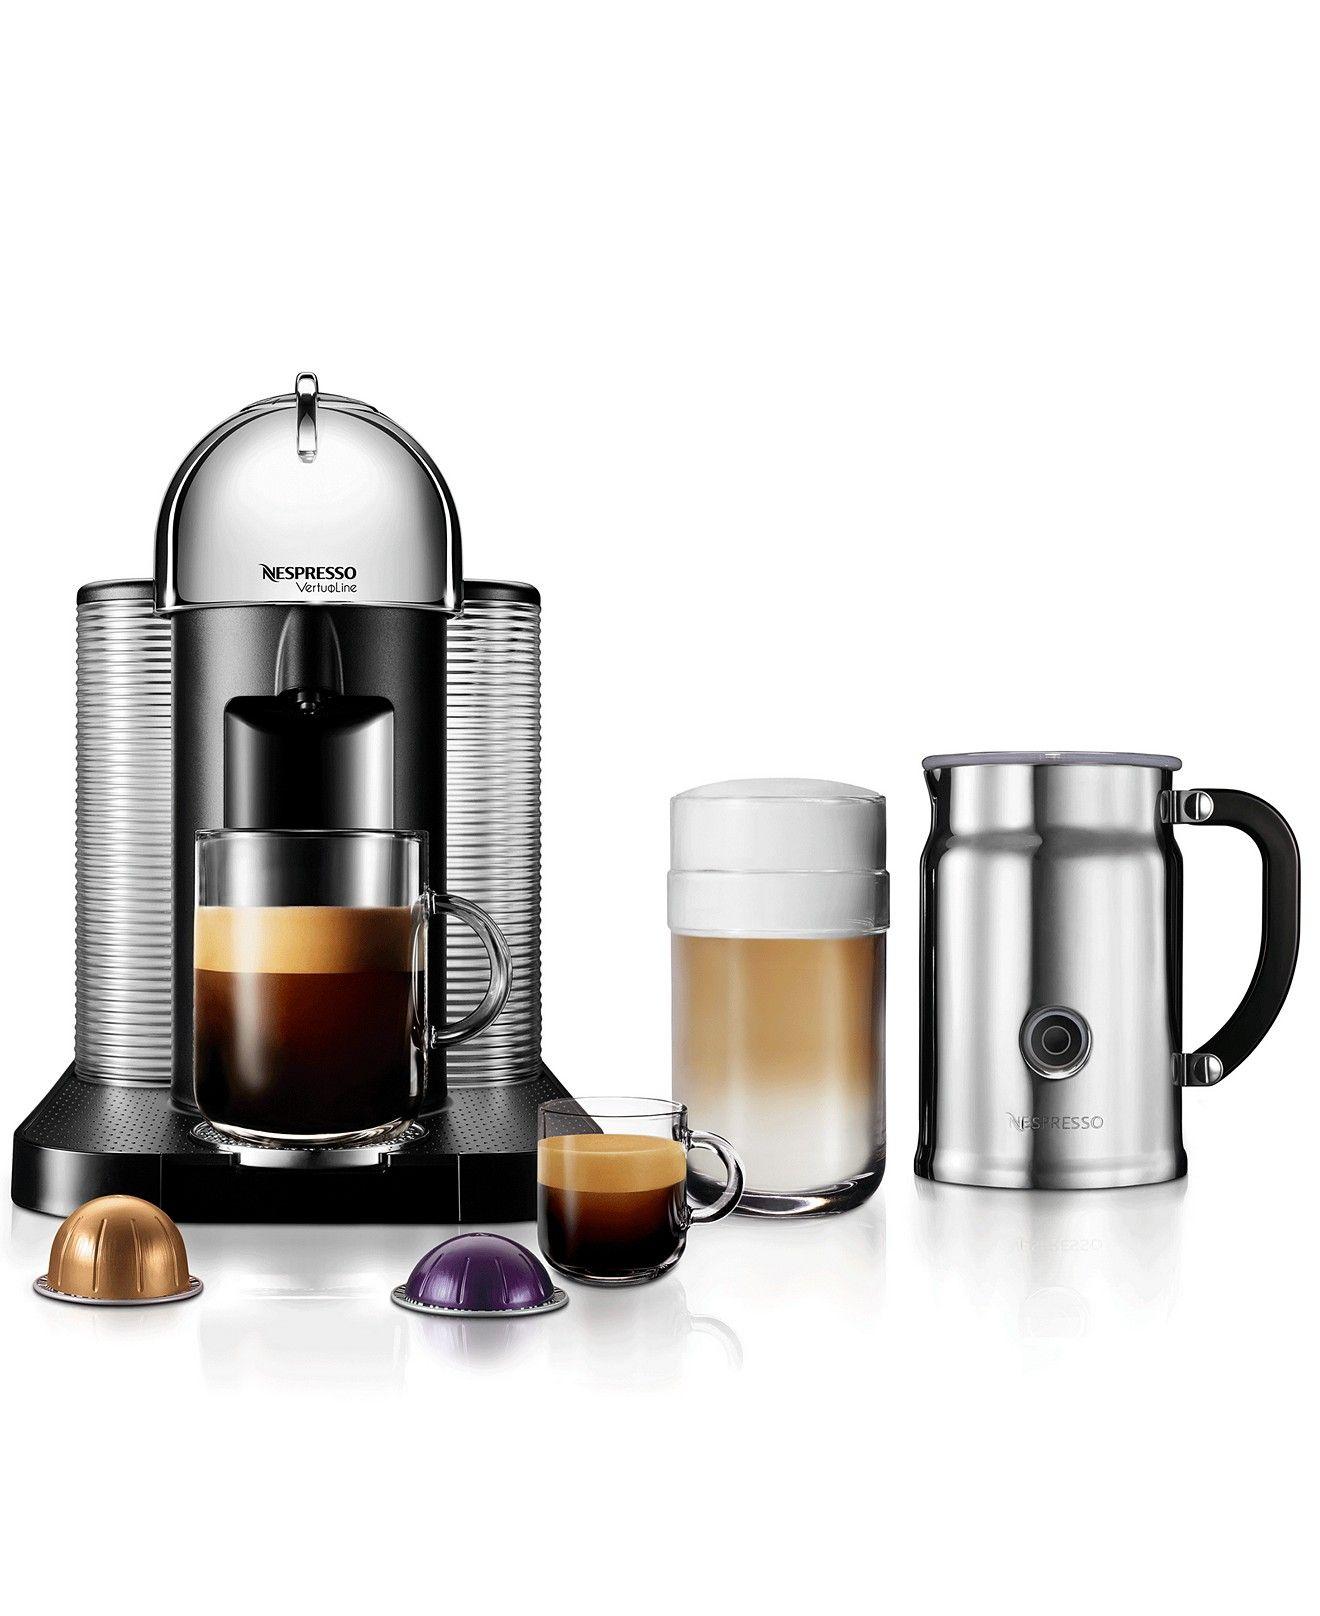 Nespresso VertuoLine Single Serve Brewer with Aerrocino